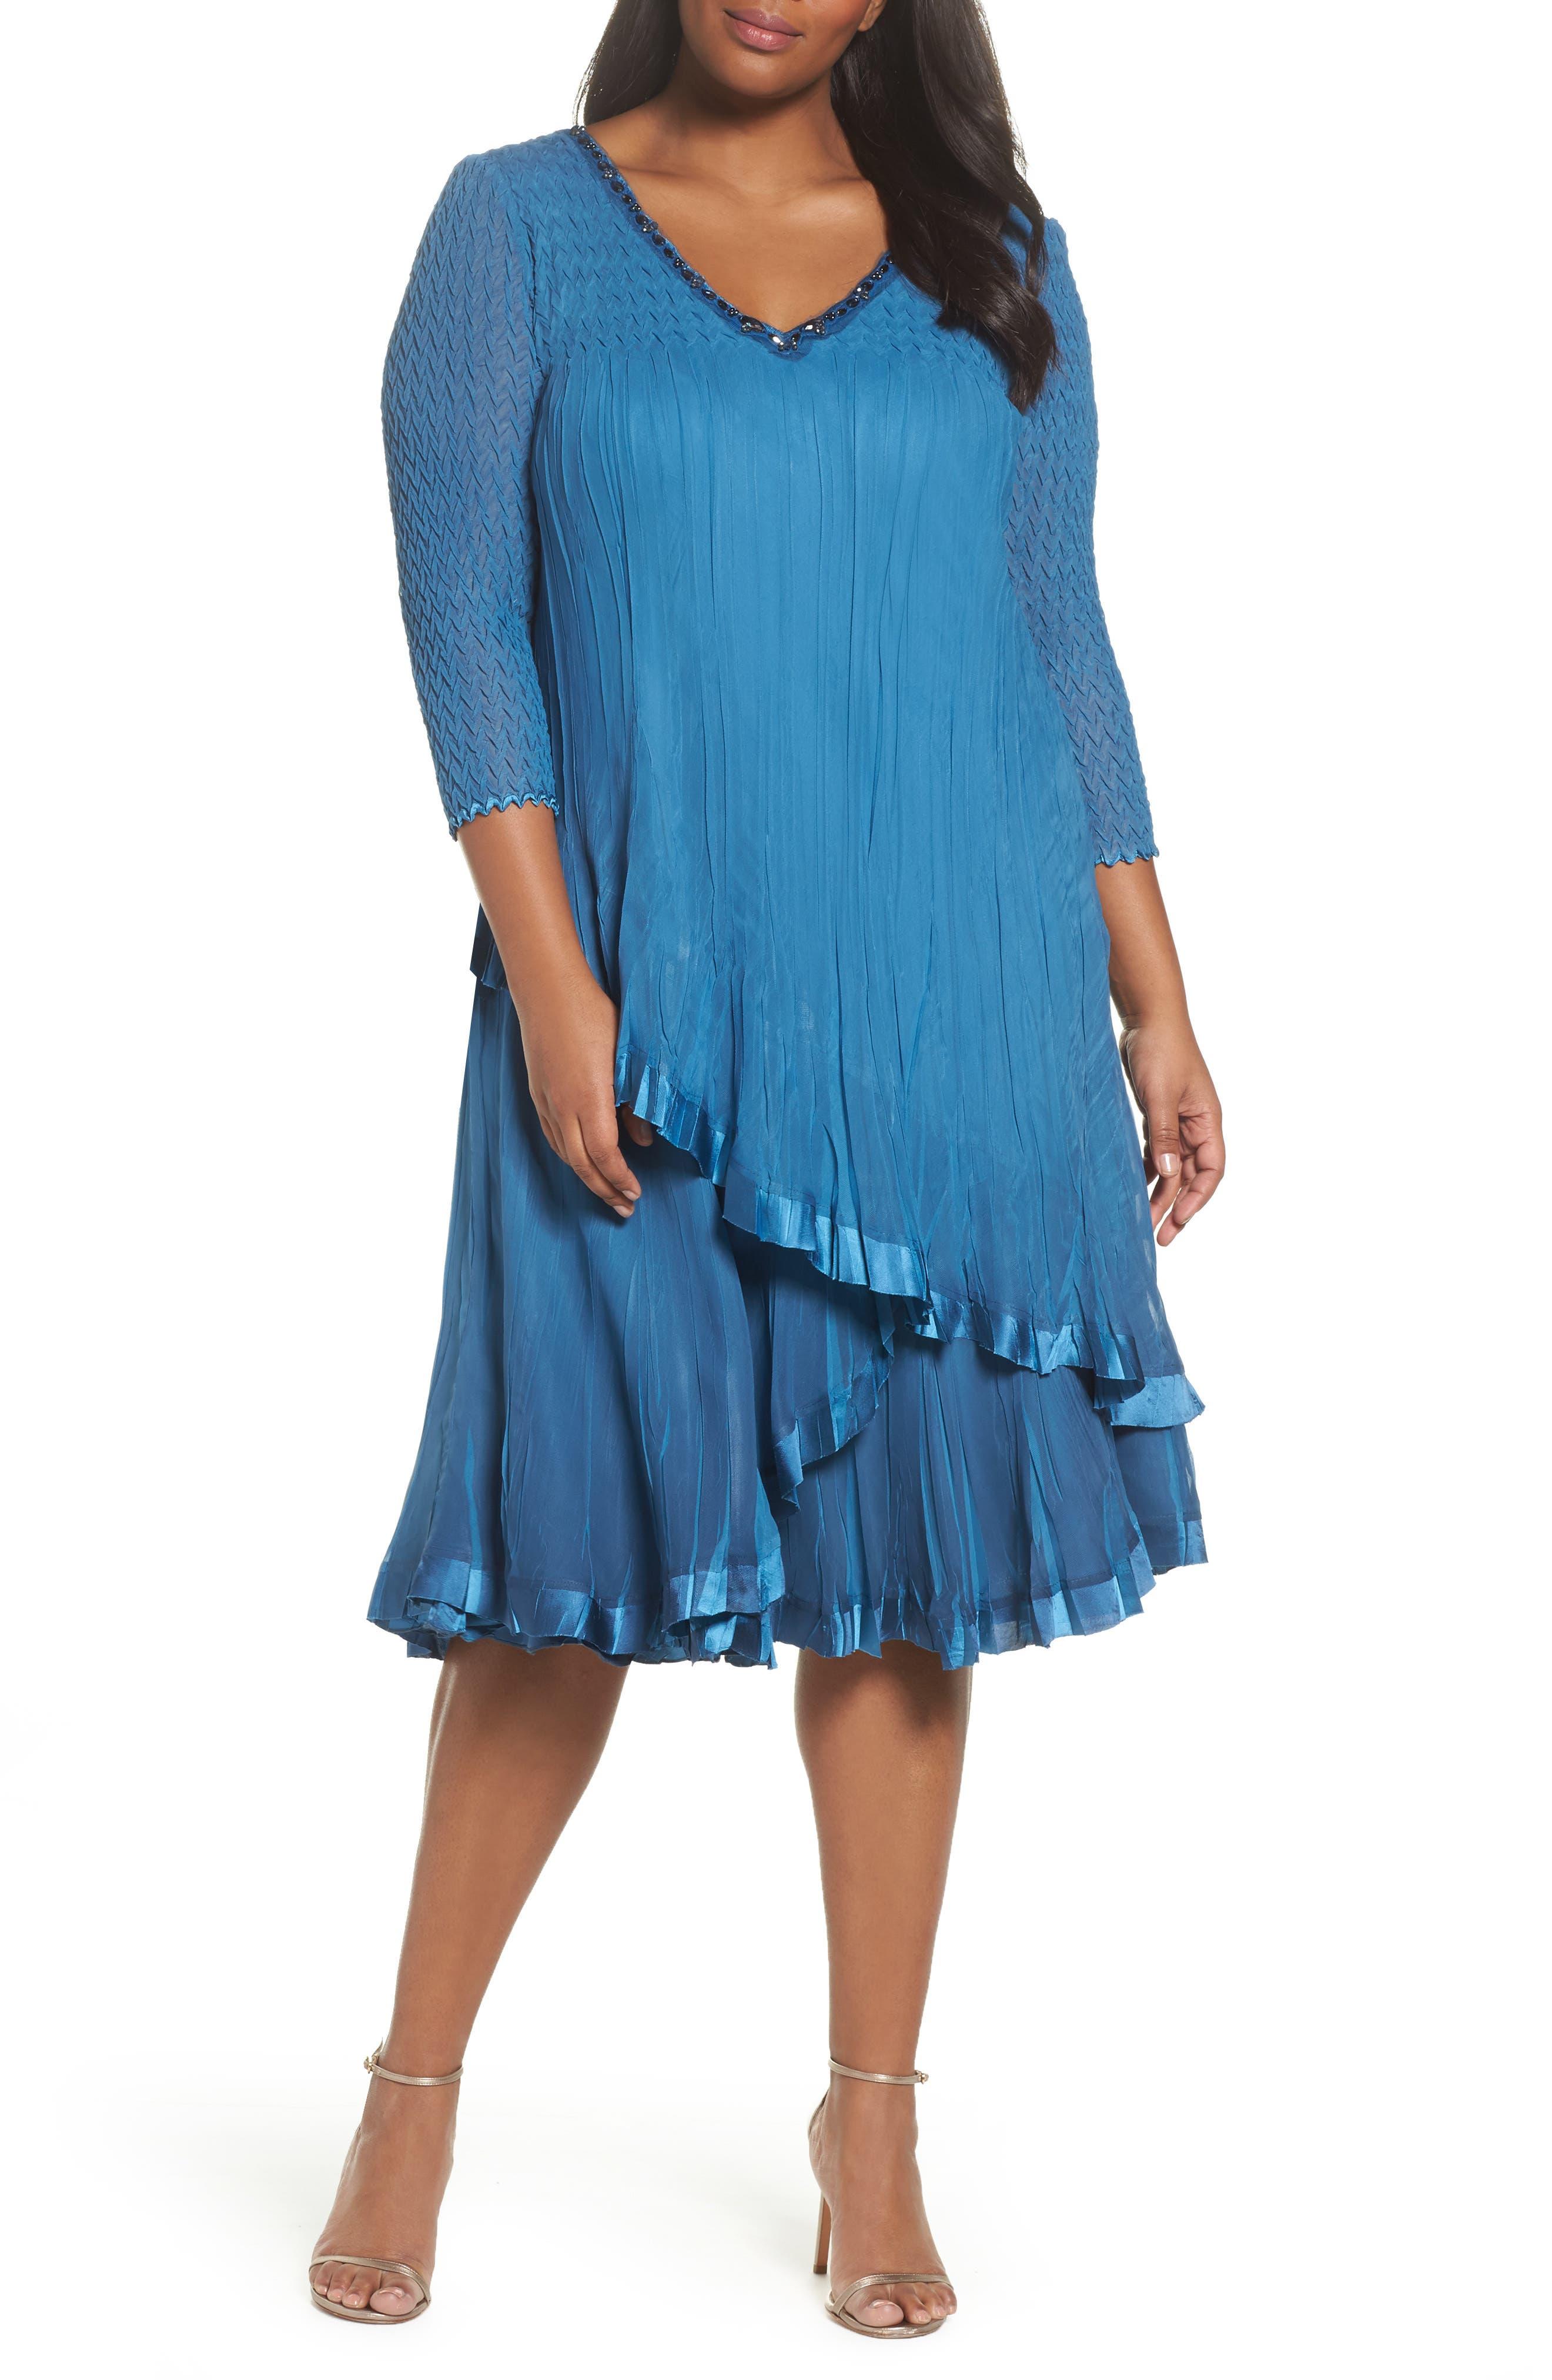 Dress Tiered Chiffon & Charmeuse Dress,                             Main thumbnail 1, color,                             Blue Dusk Night Ombre